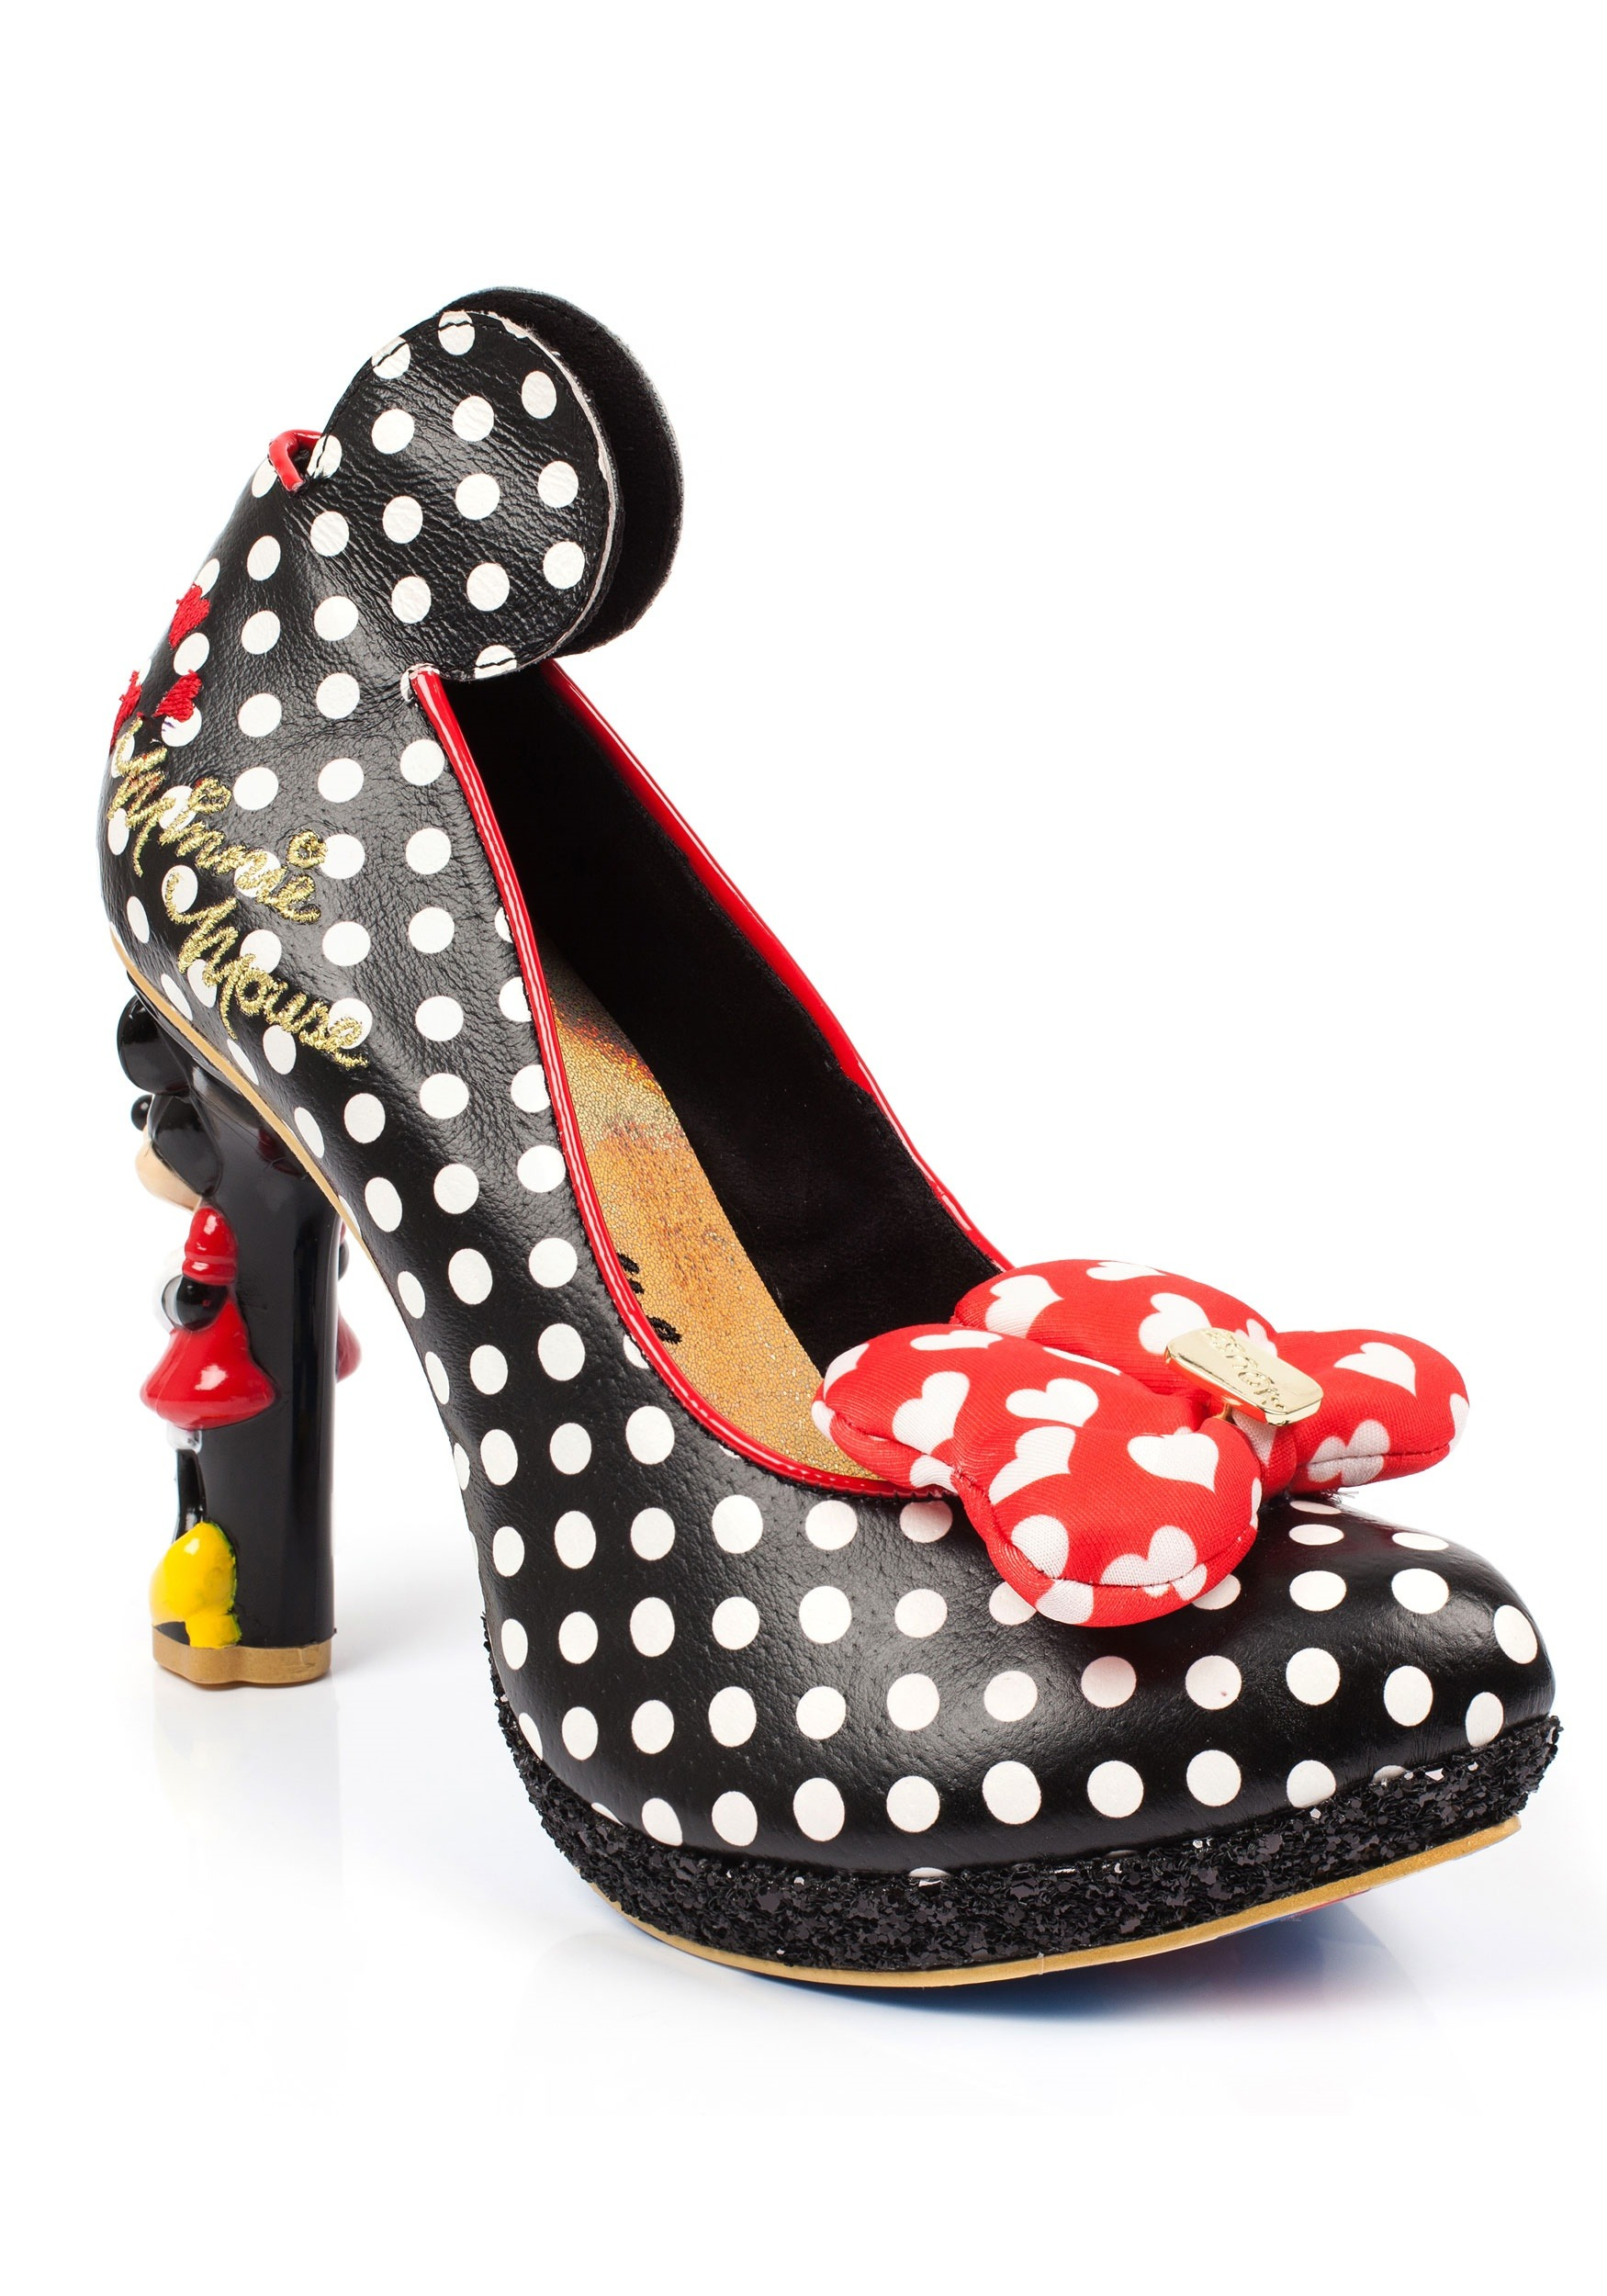 5445094a3422 Disney Oh My! Polka Dot Minnie Character Heels